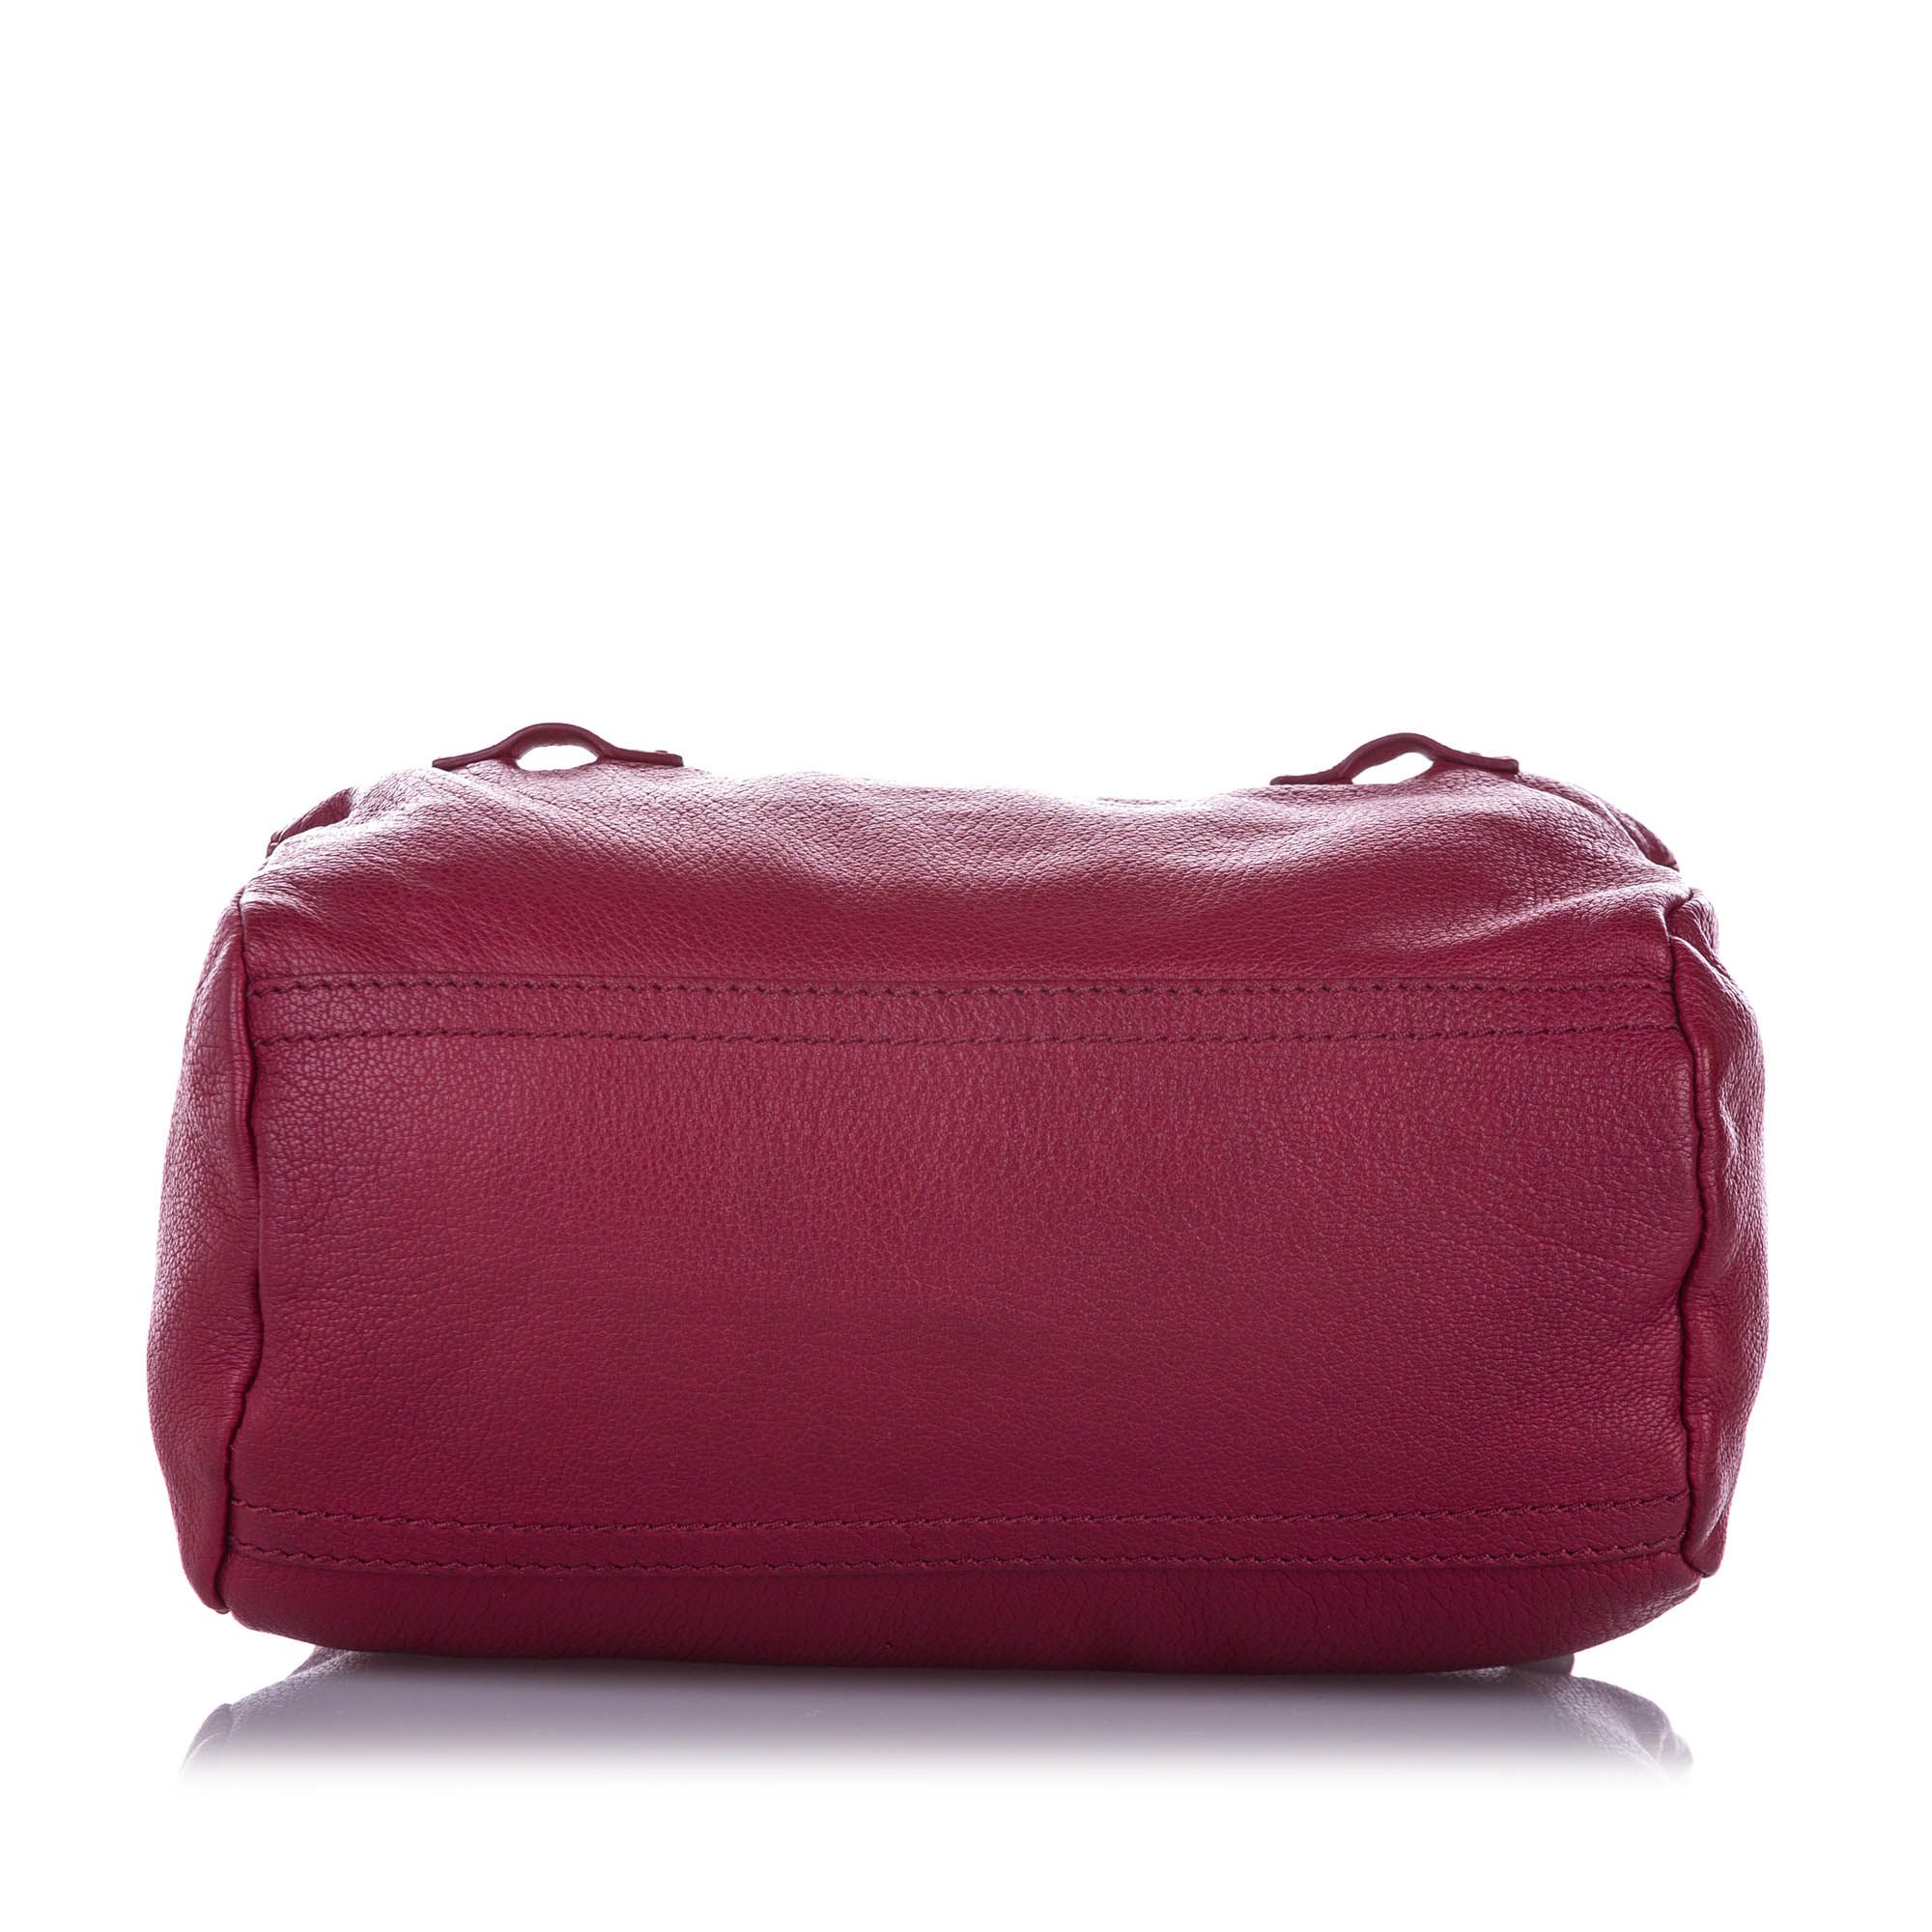 Vintage Givenchy Mini Pandora Leather Crossbody Bag Pink